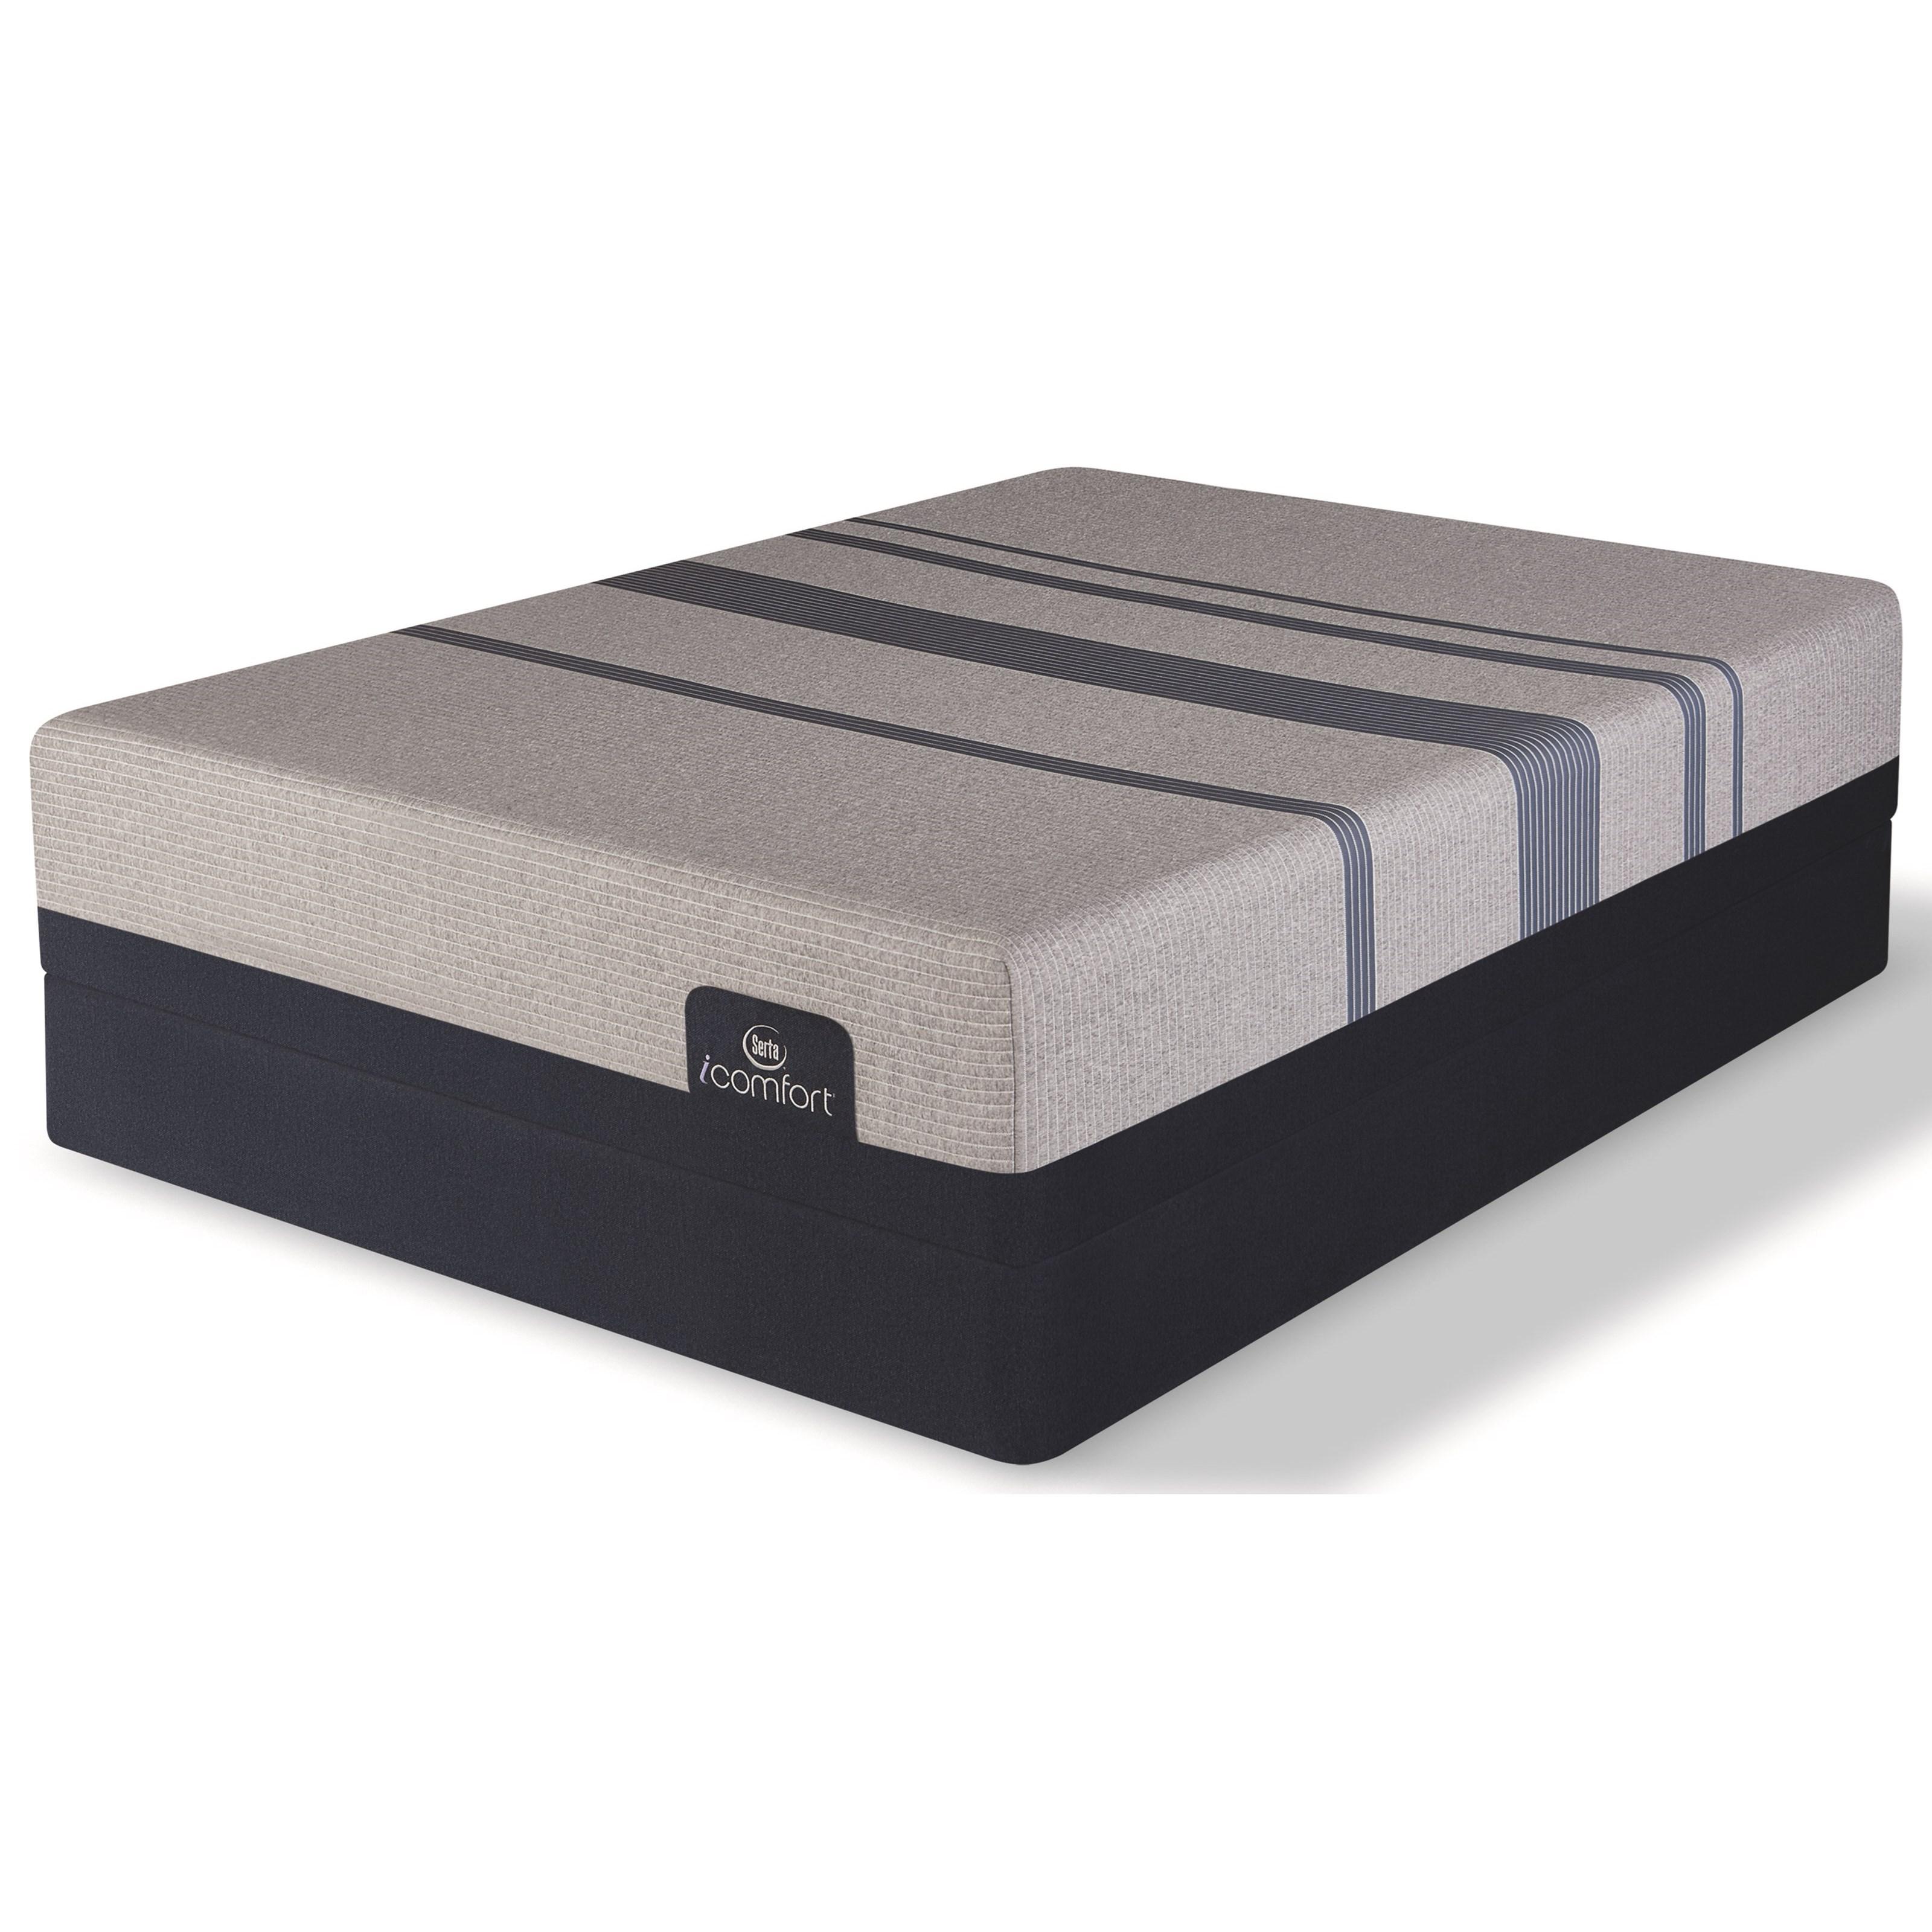 Serta iComfort Blue Max 1000 Cushion Firm Queen Cushion Firm Memory Foam LP Set - Item Number: 500801268-1050+500117499-6050